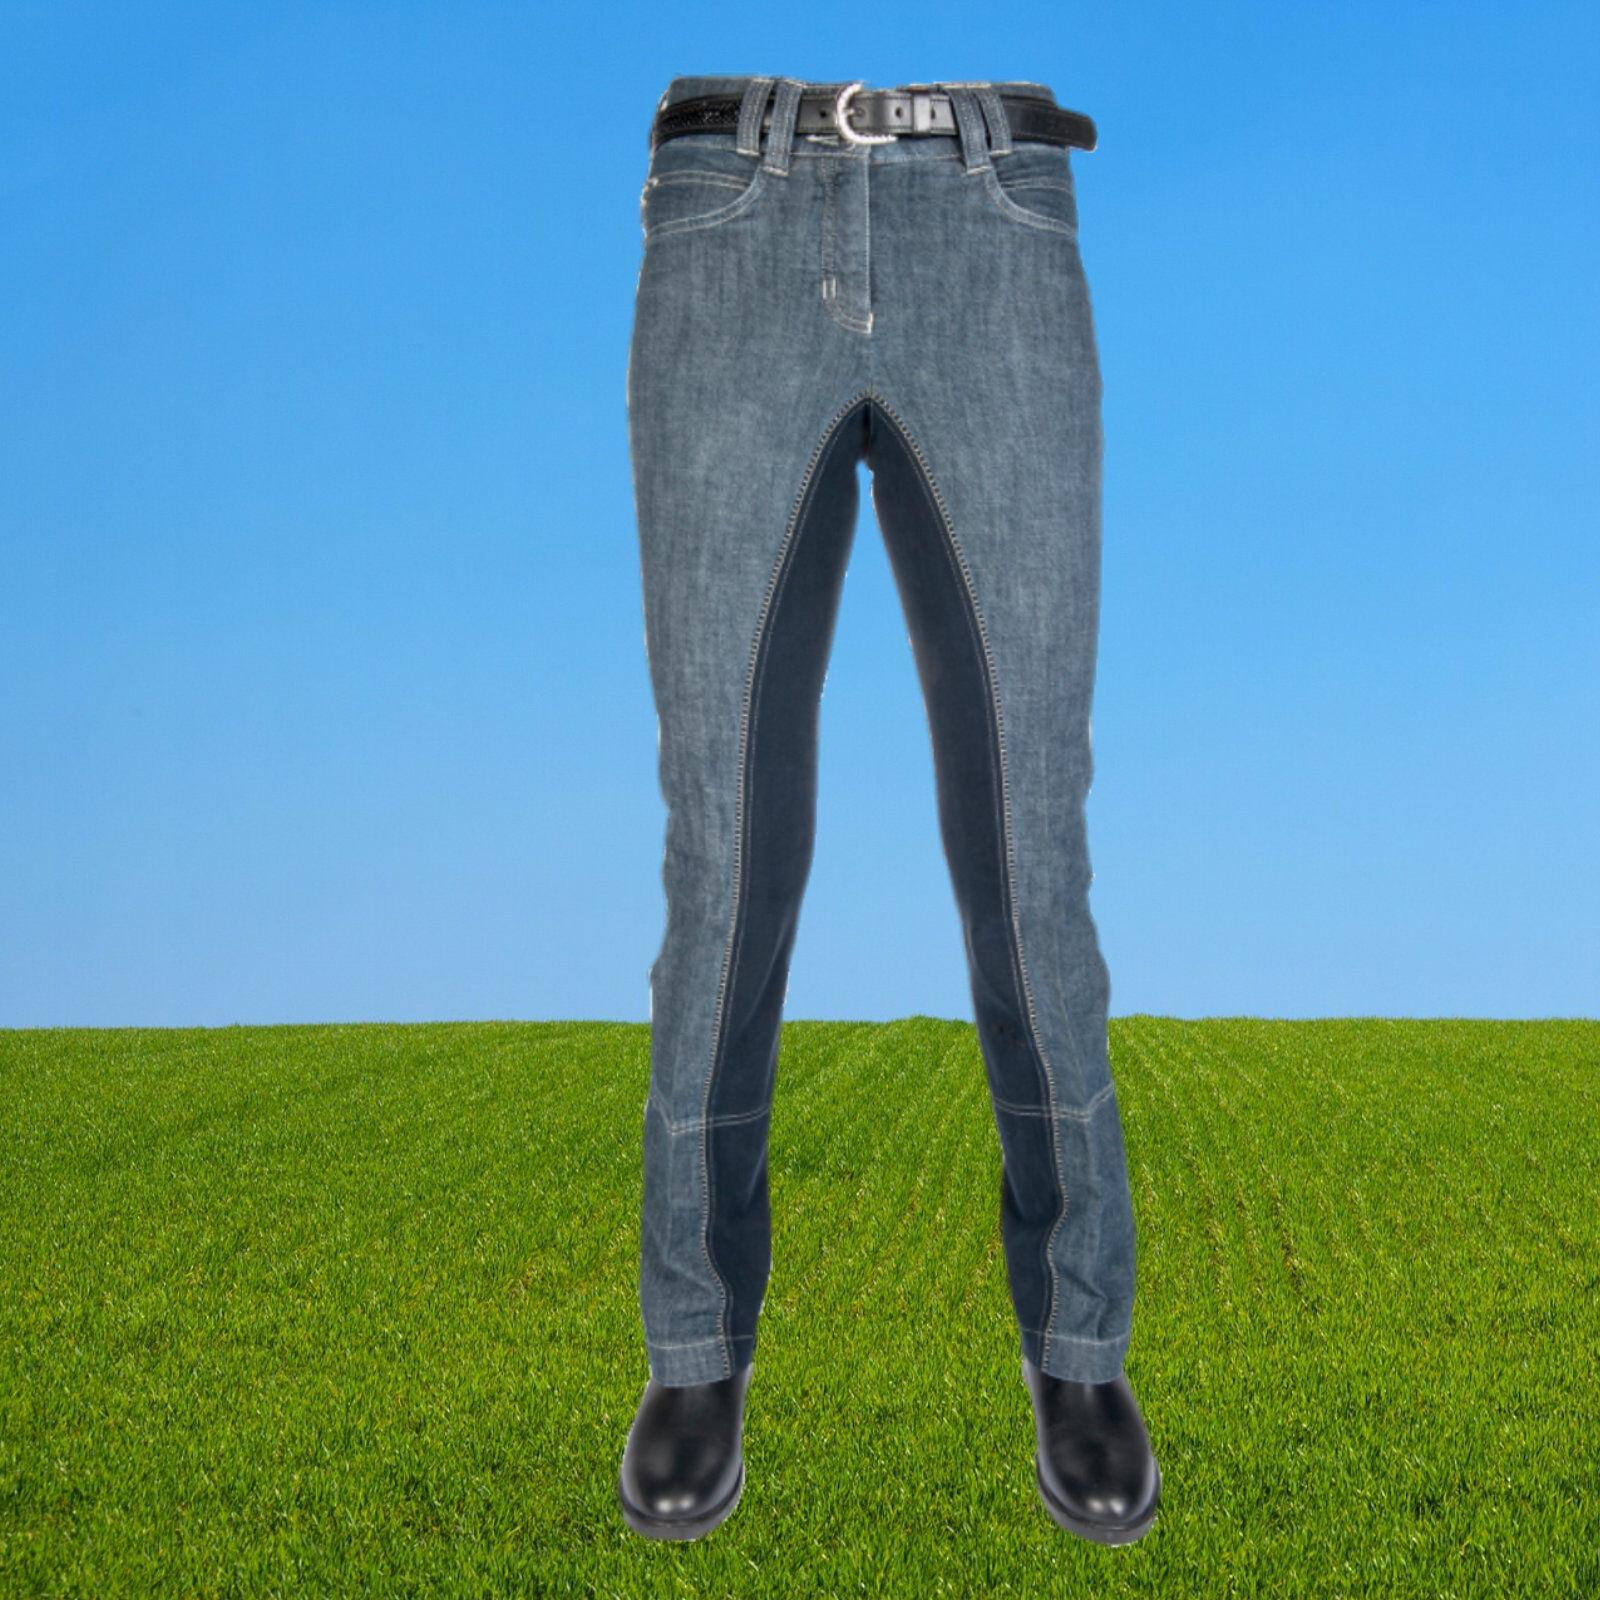 HKM Kinder Jodhpur Reithose Jeans, Blink, Miss Blink, Jeans, Hochbund, Kids Jodhpurreithose 91d6d3